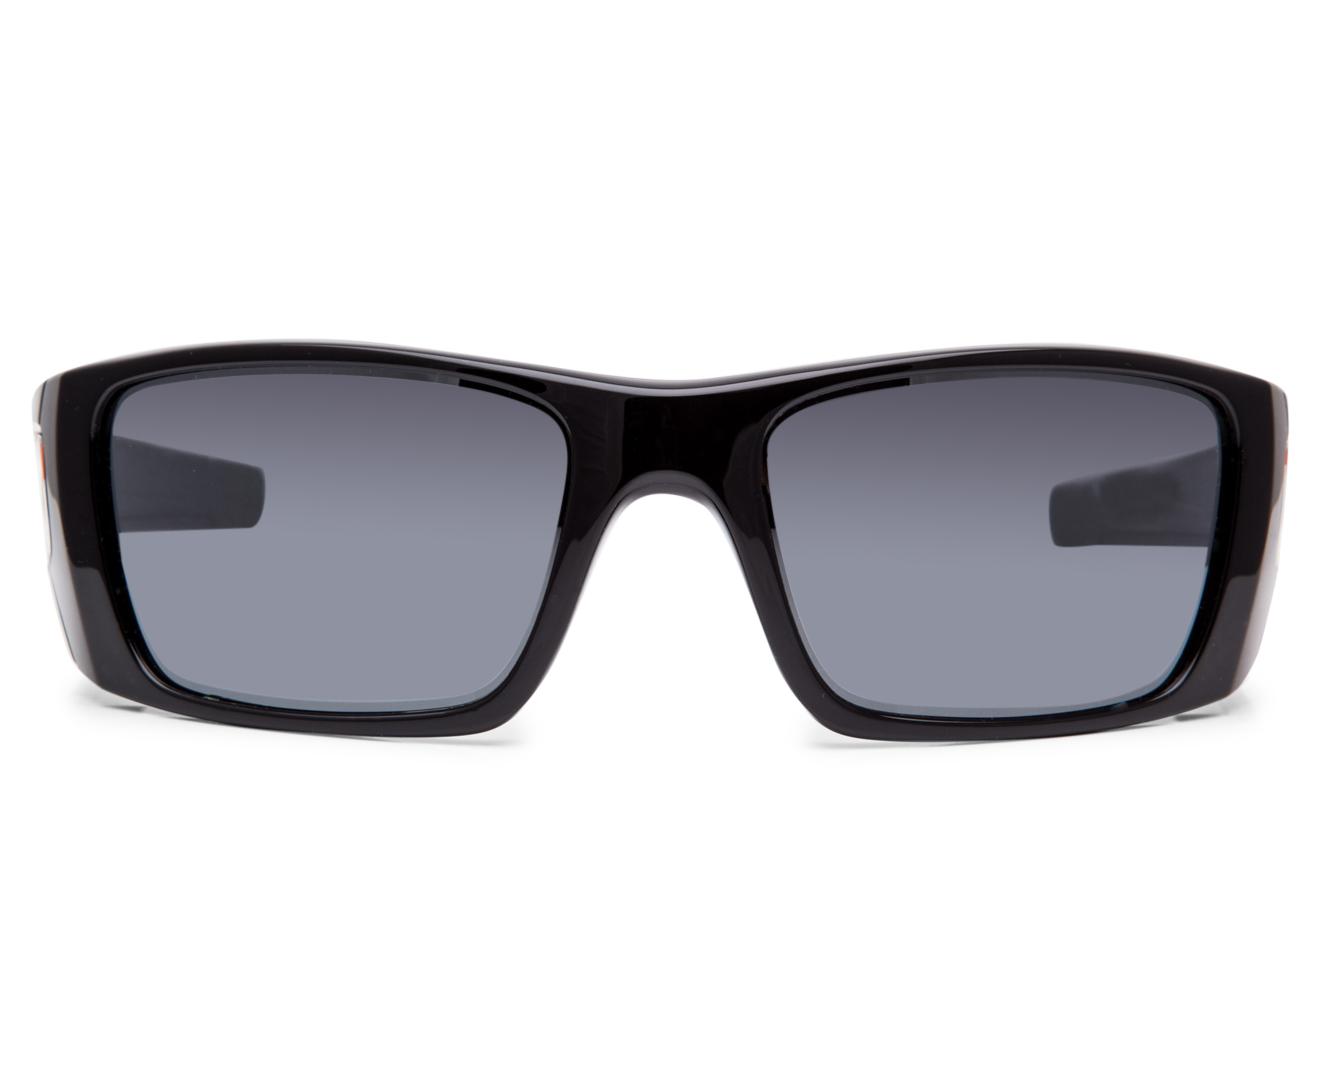 be02286f7887a Oakley Fuel Cell Sunglasses - Polished Black Black Iridium